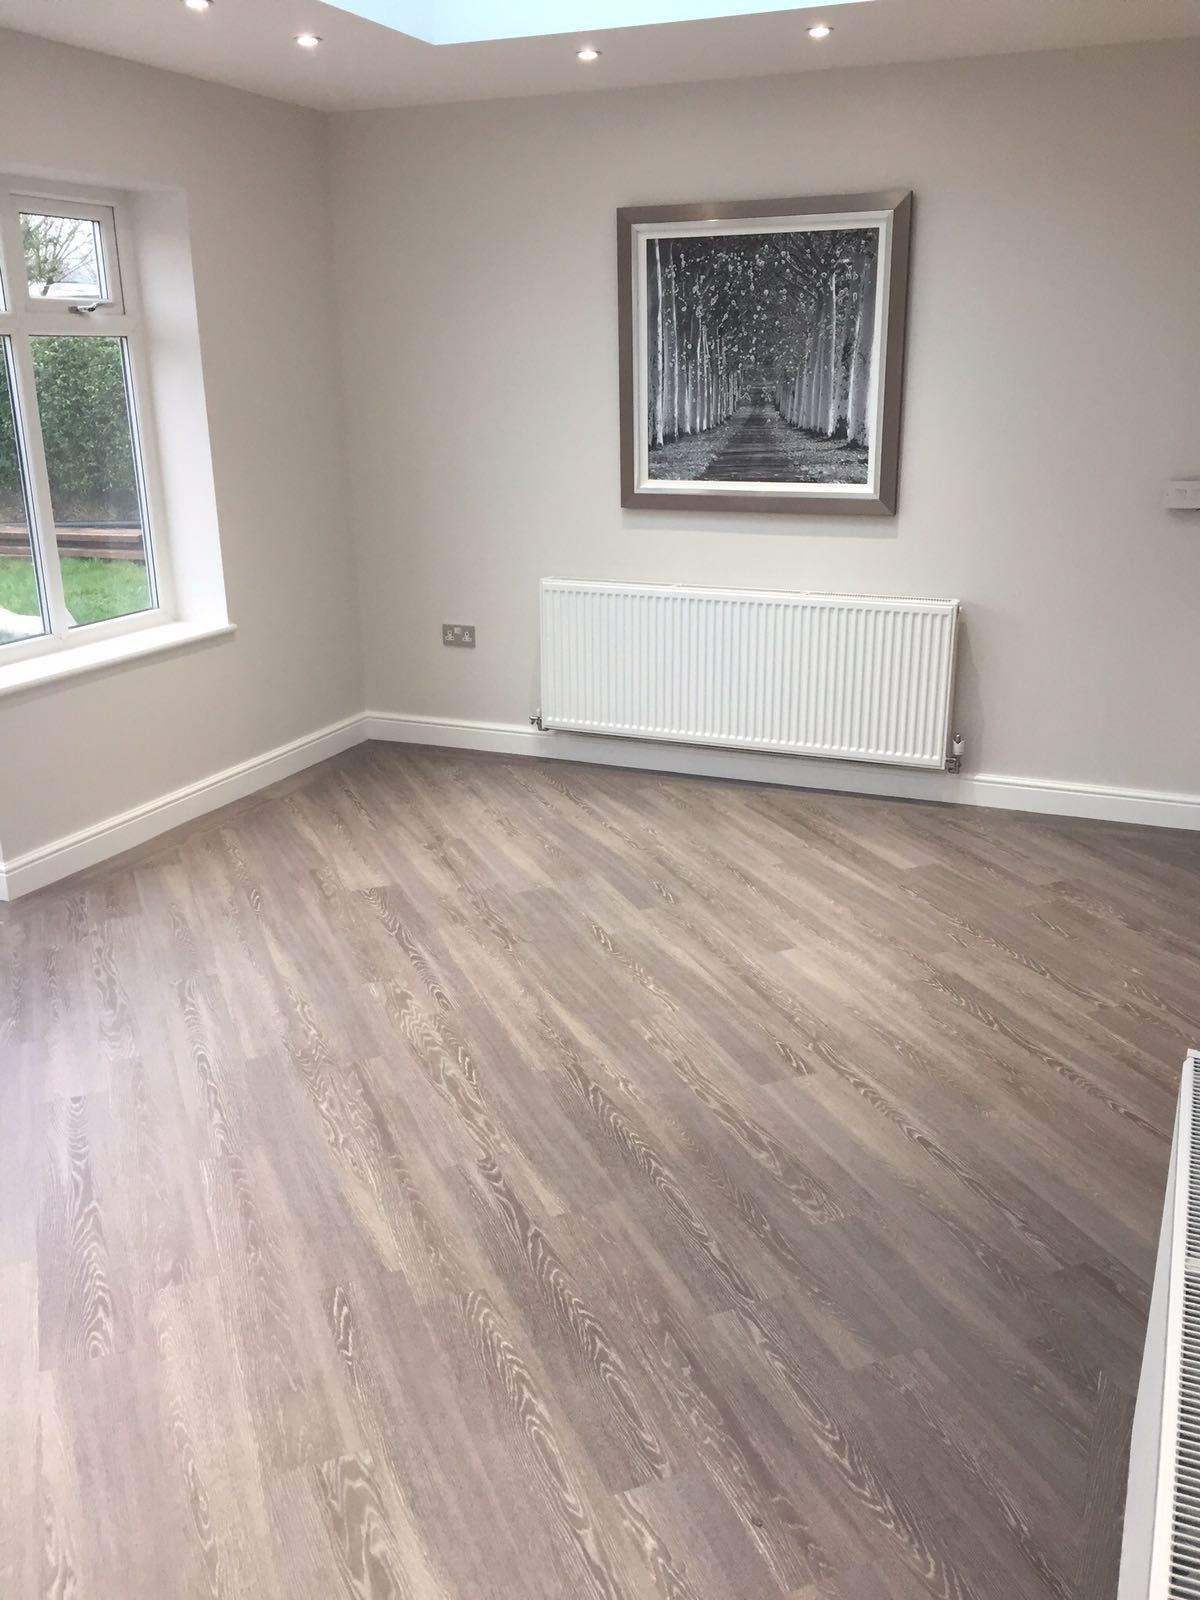 J2 Flooring Smoky Grey Oak Lvt Design Floor Luxury Vinyl